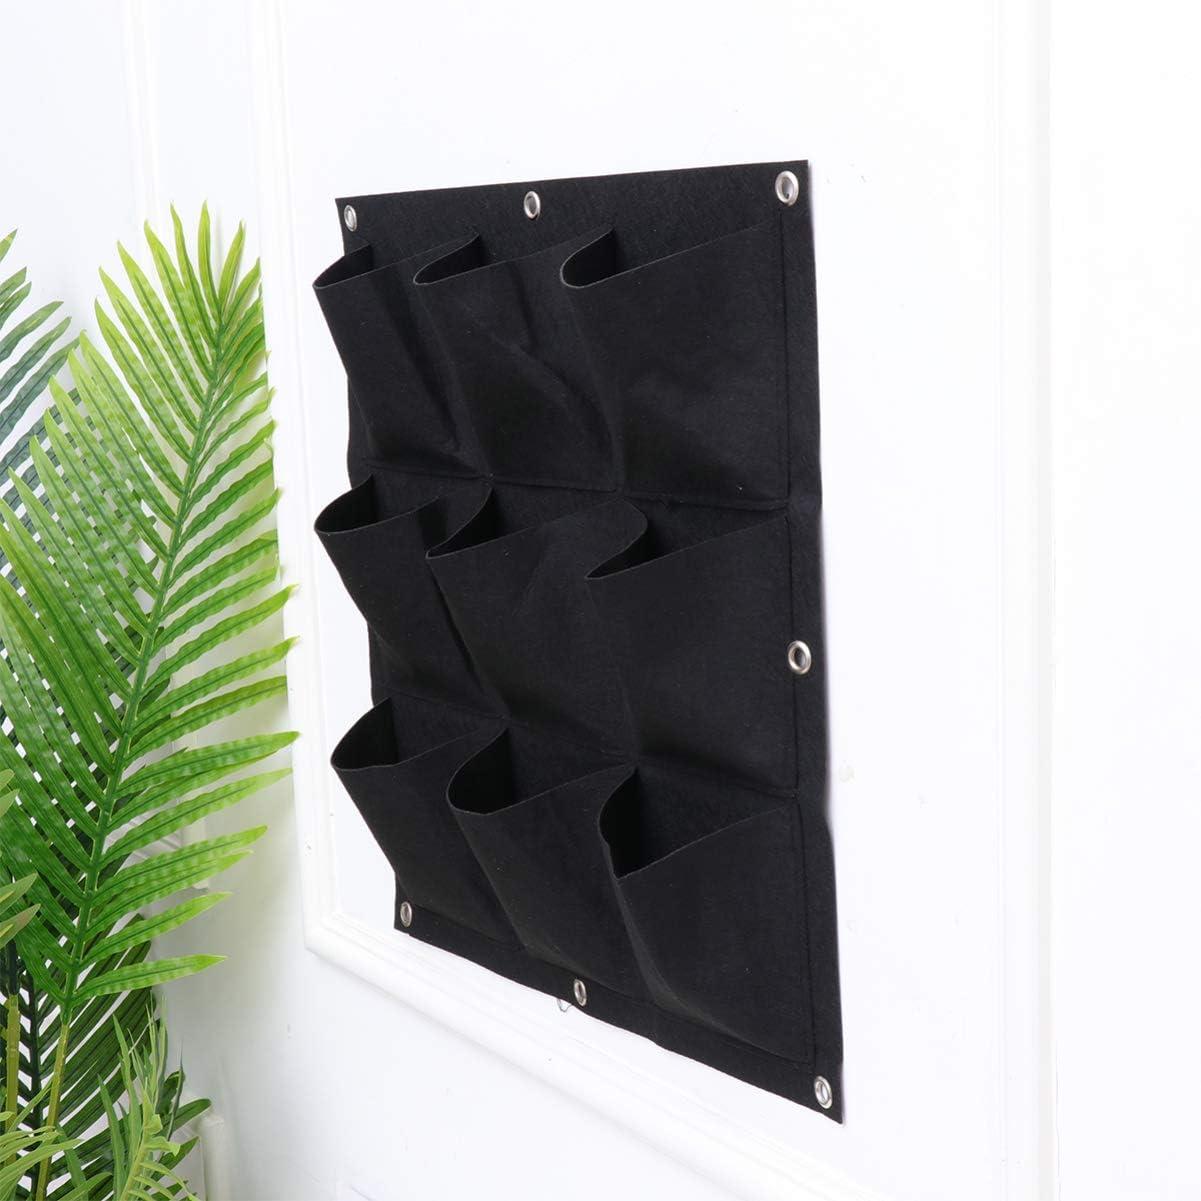 BESPORTBLE 9 Pocket Vertical Garden Planter Wall Mounted Planting Bags Hangers Outdoor Indoor Vertical Greening Grow Bags